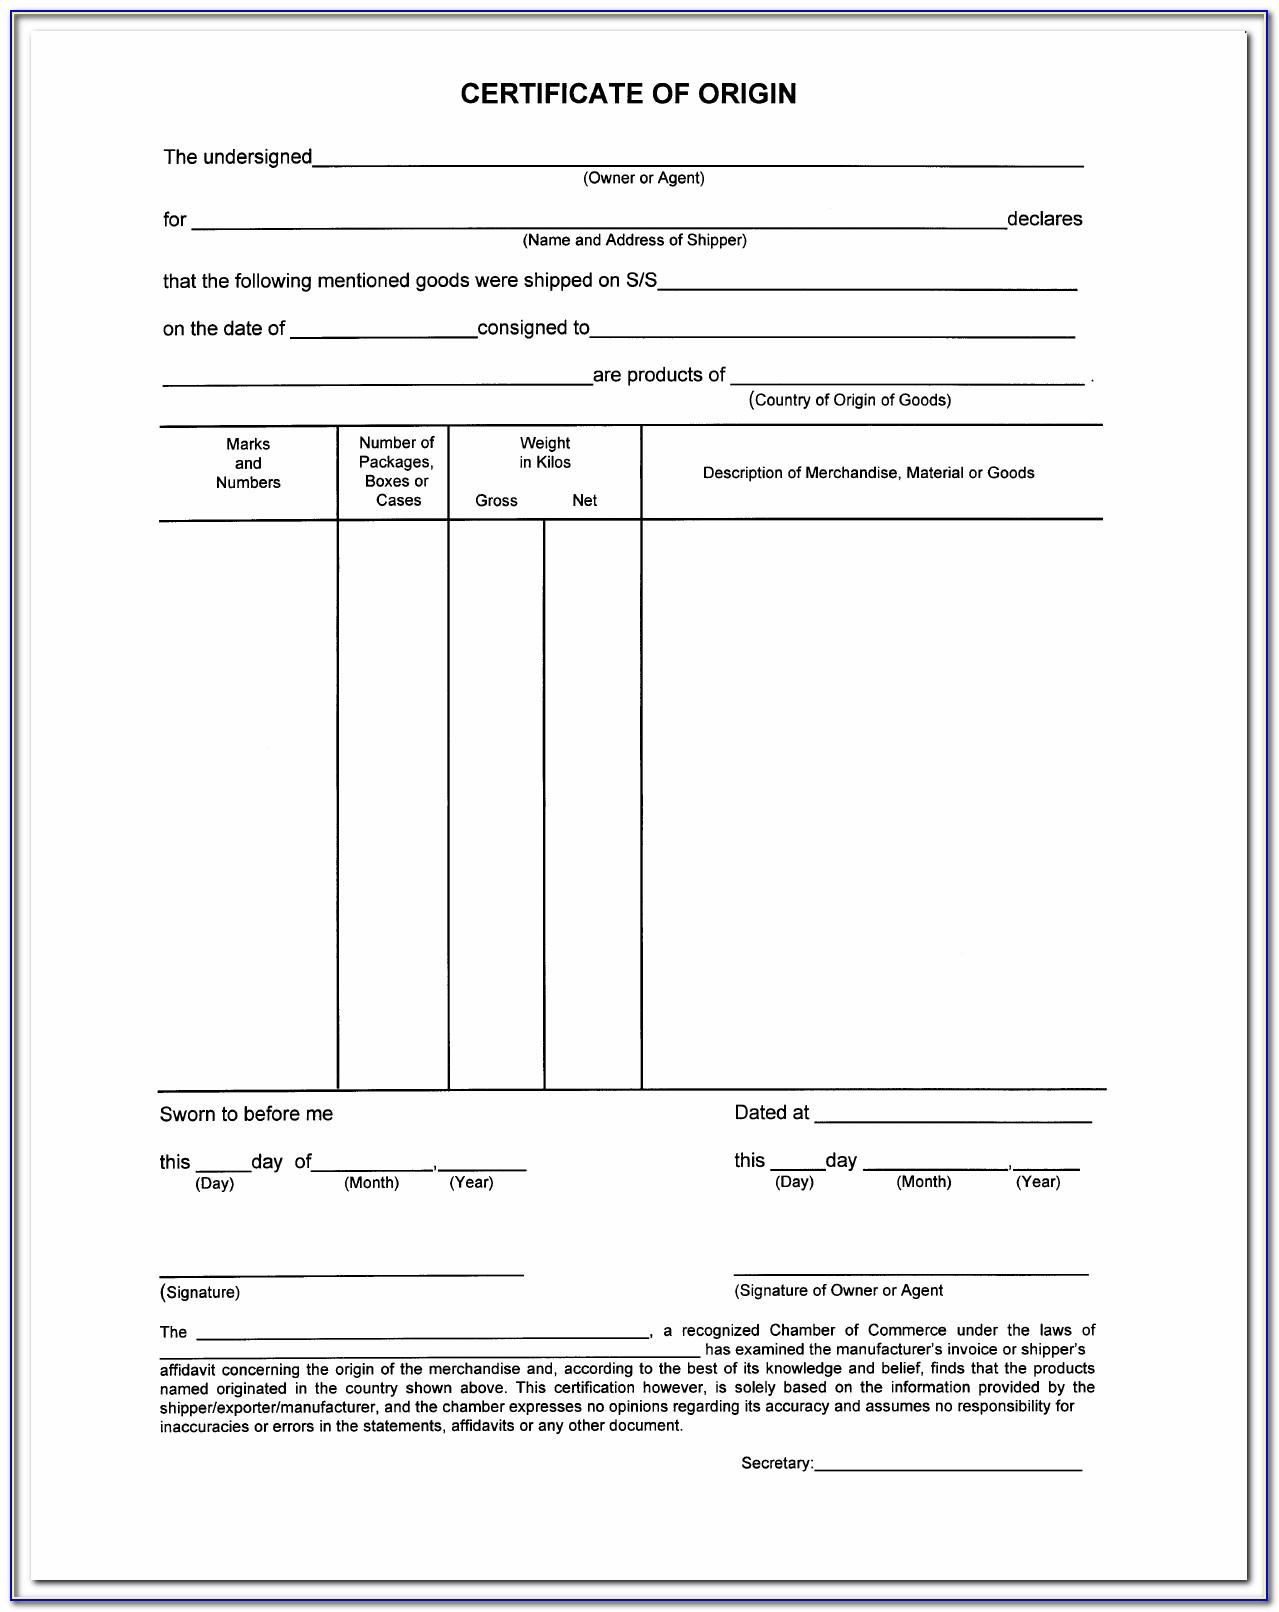 Blank Certificate Of Origin Forms